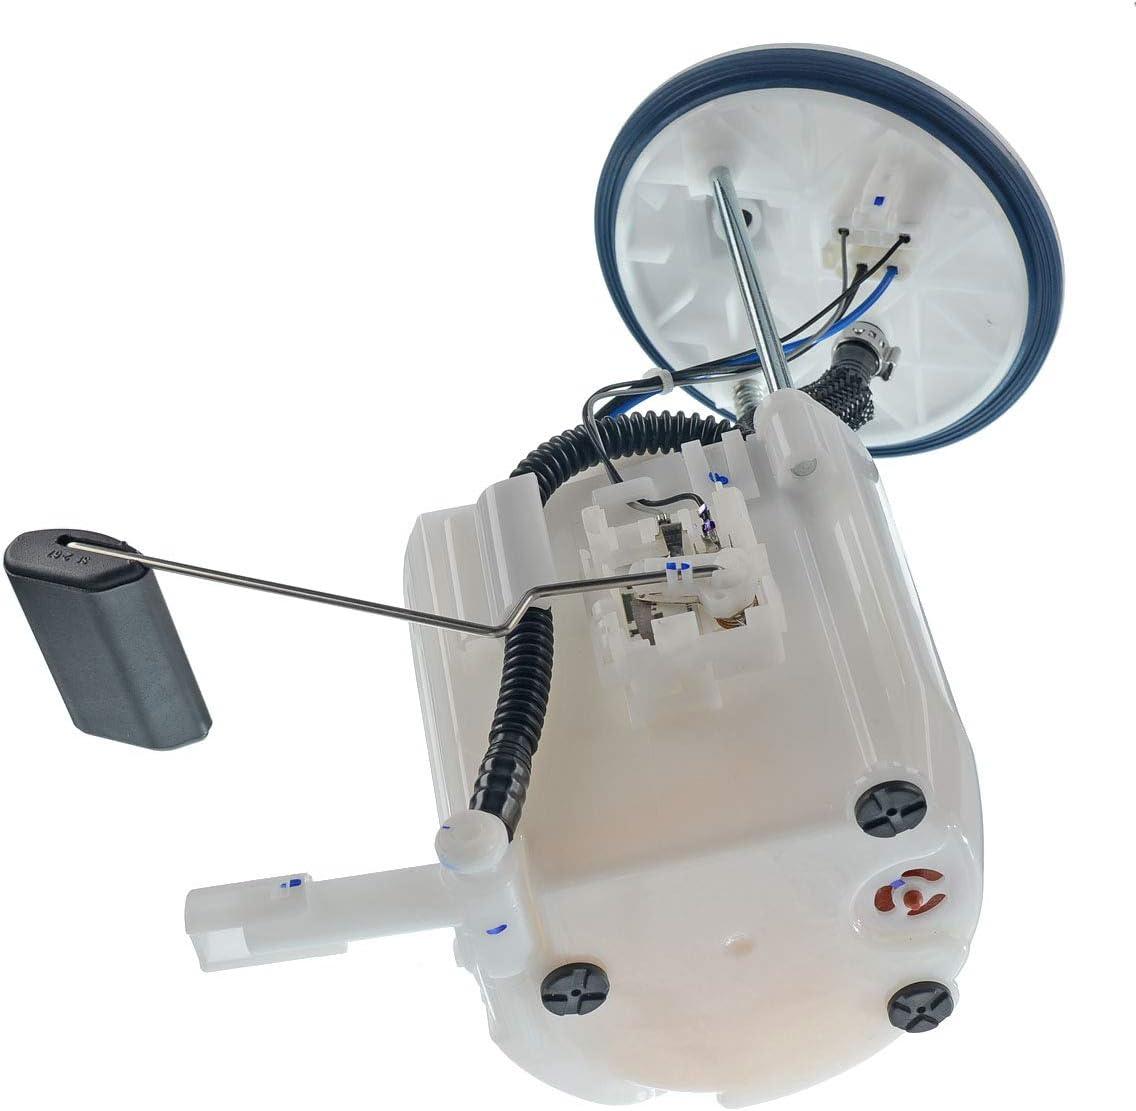 Electrical Fuel Pump Module Assembly for 2011 Kia Optima L4 2.4L E9032M SP3984M